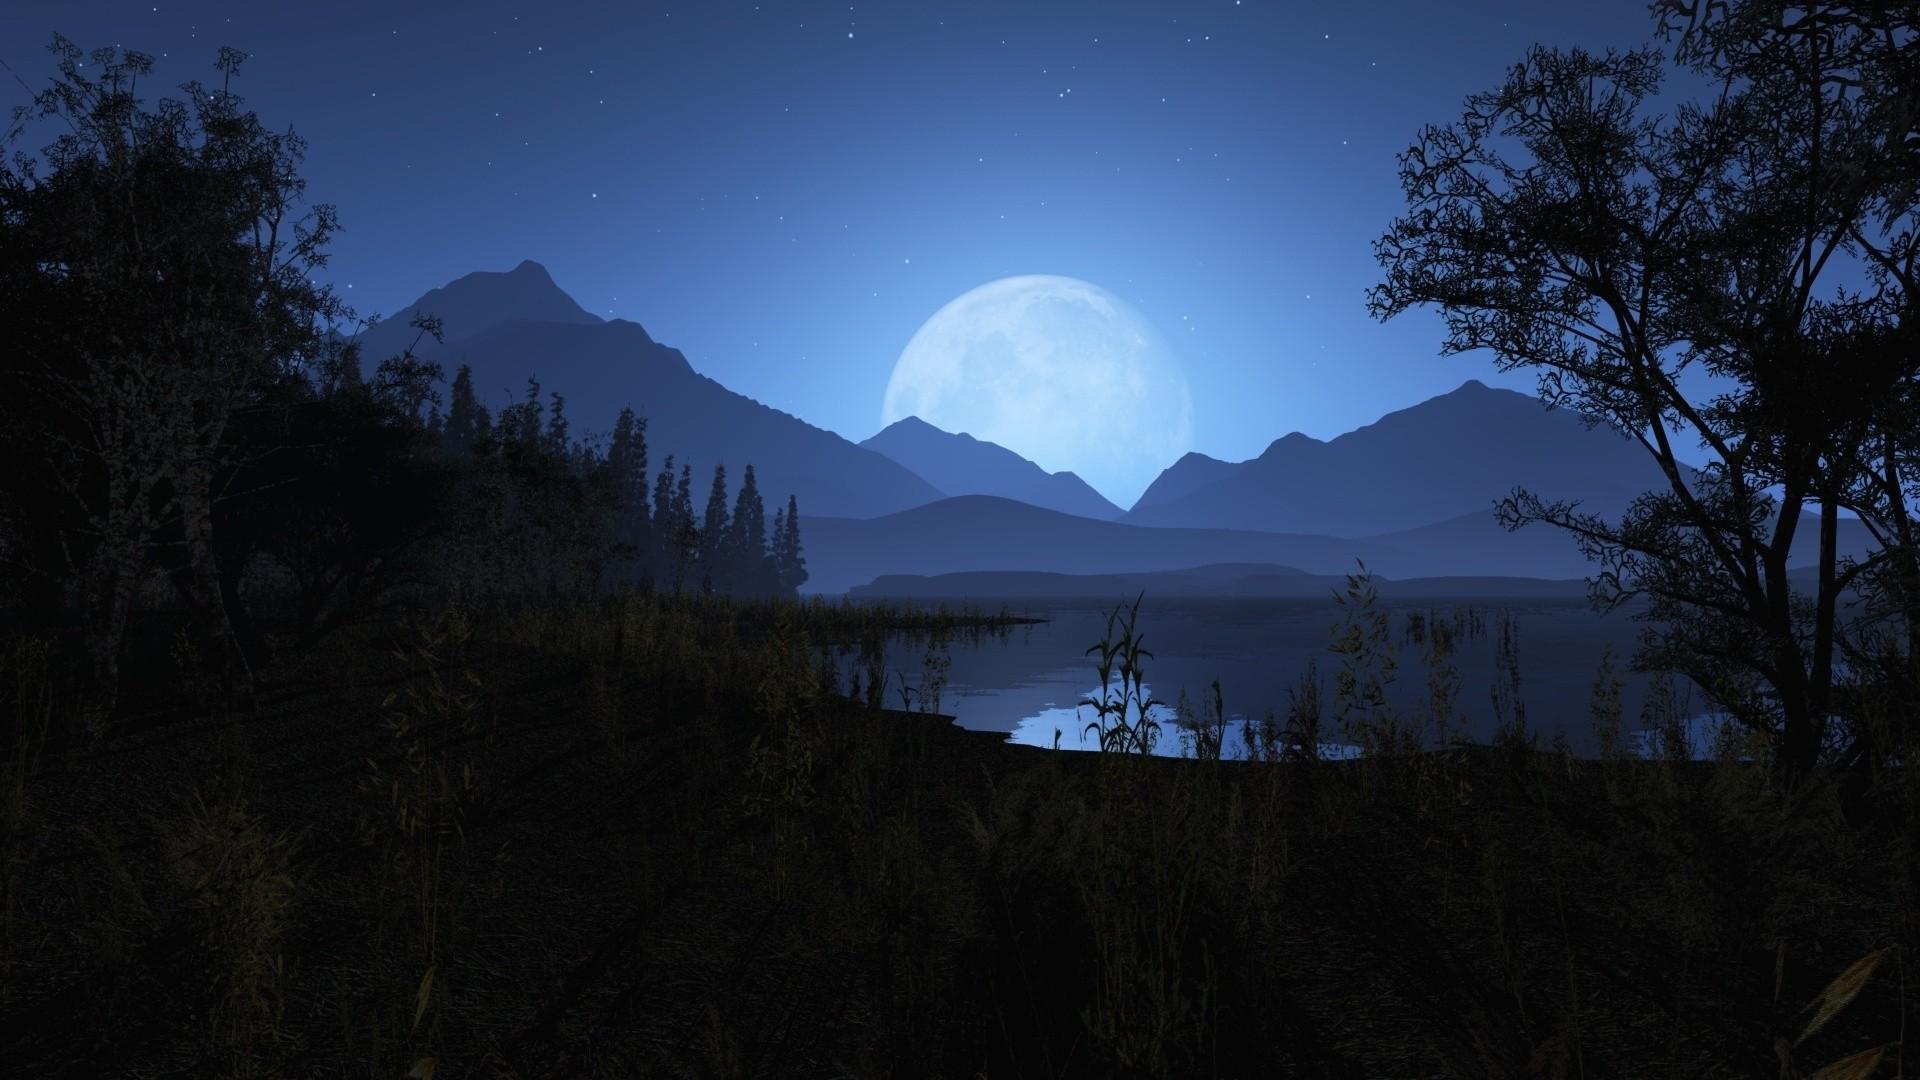 Night Time Wallpaper image hd